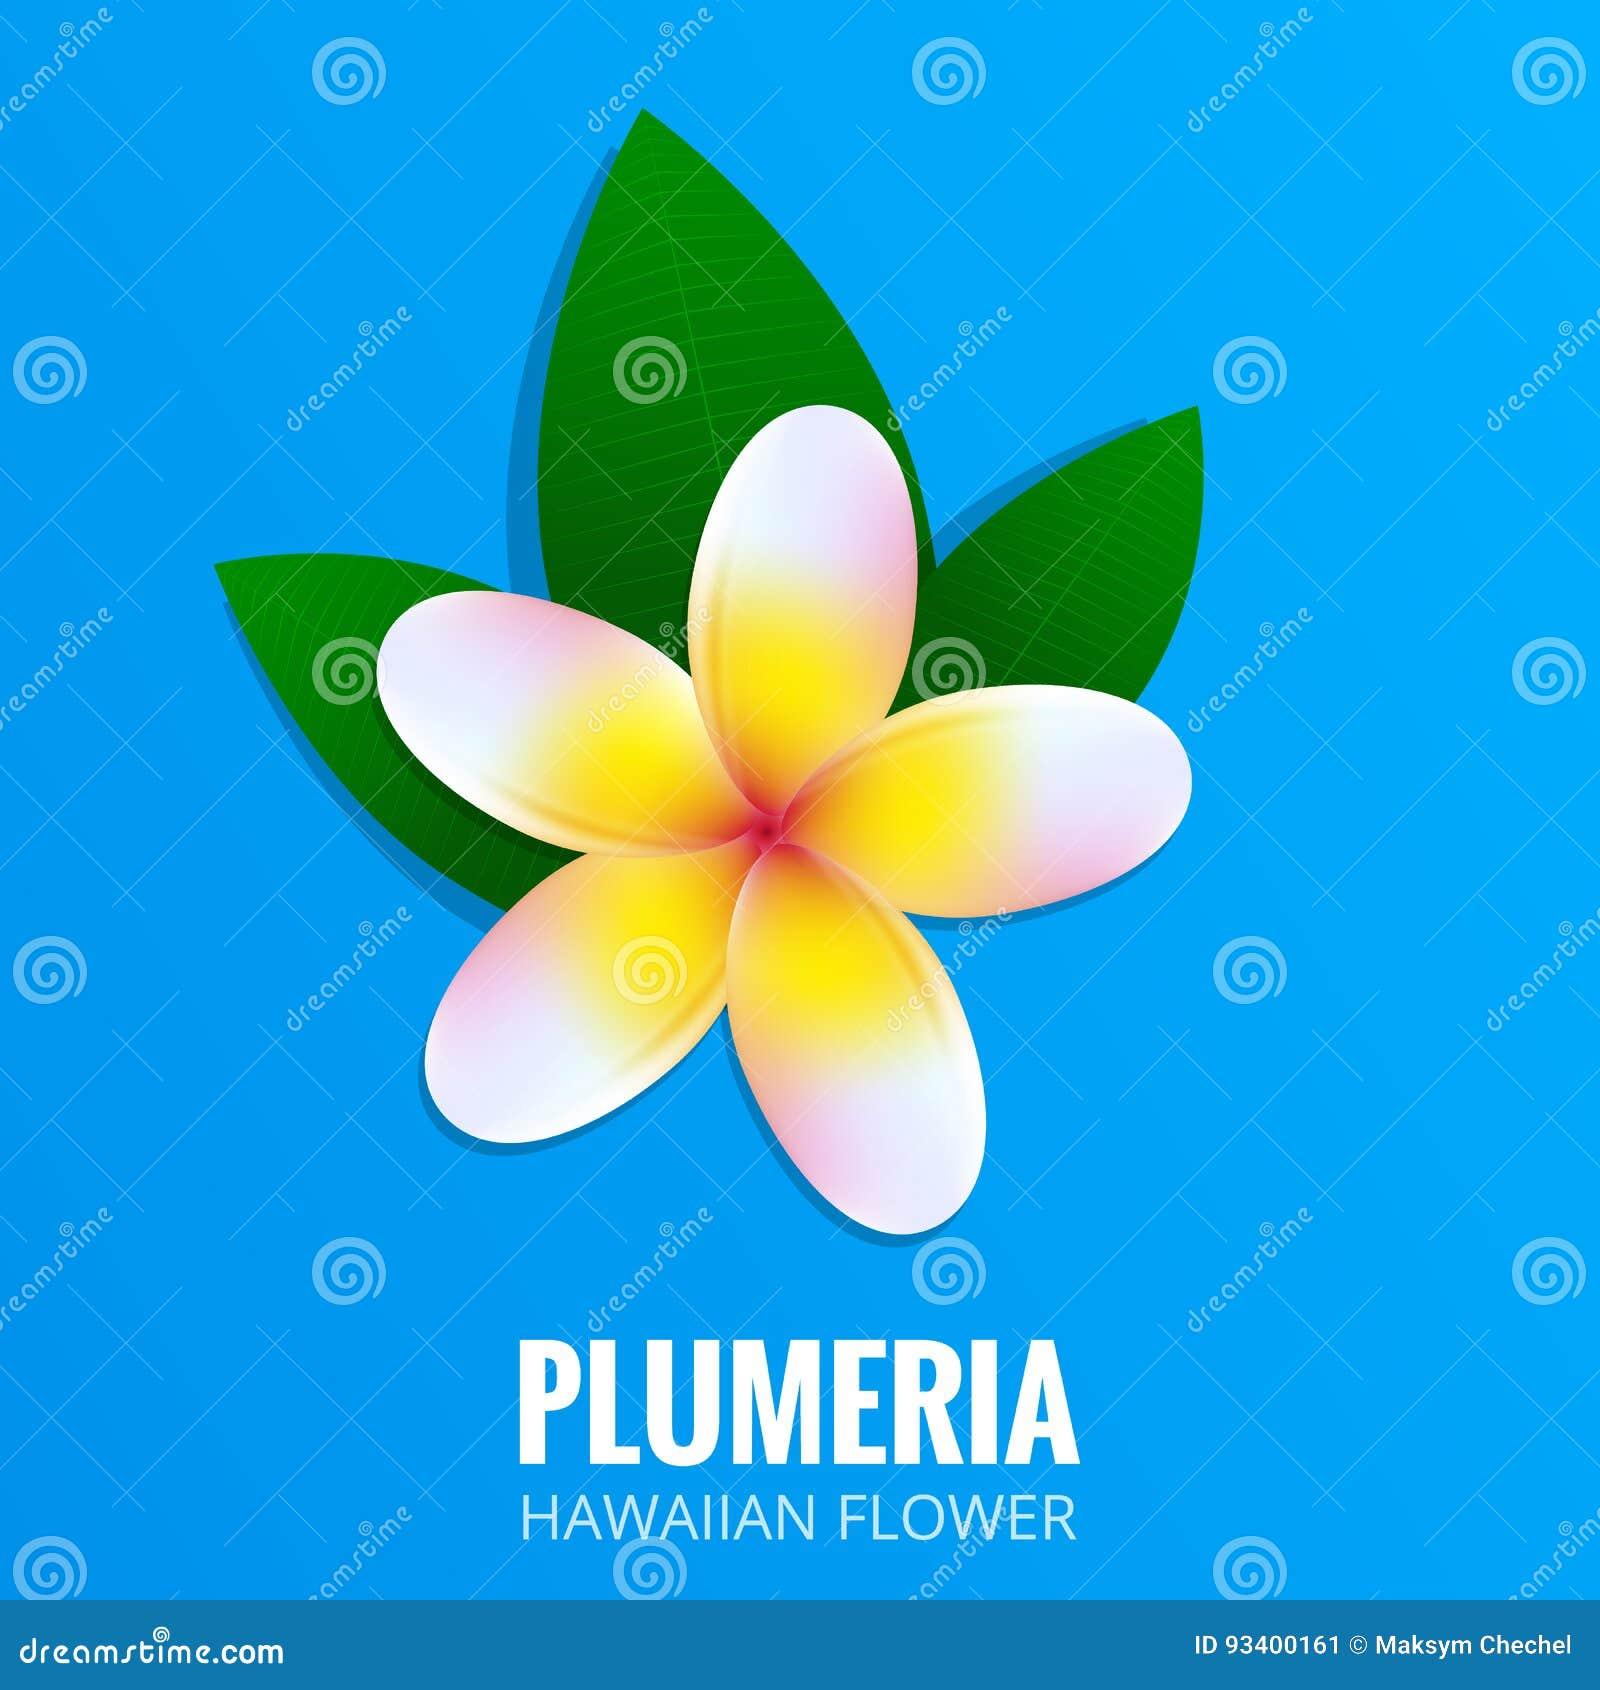 Plumeria Hawaiian Flower Frangipani Tropical Flower With Leaves